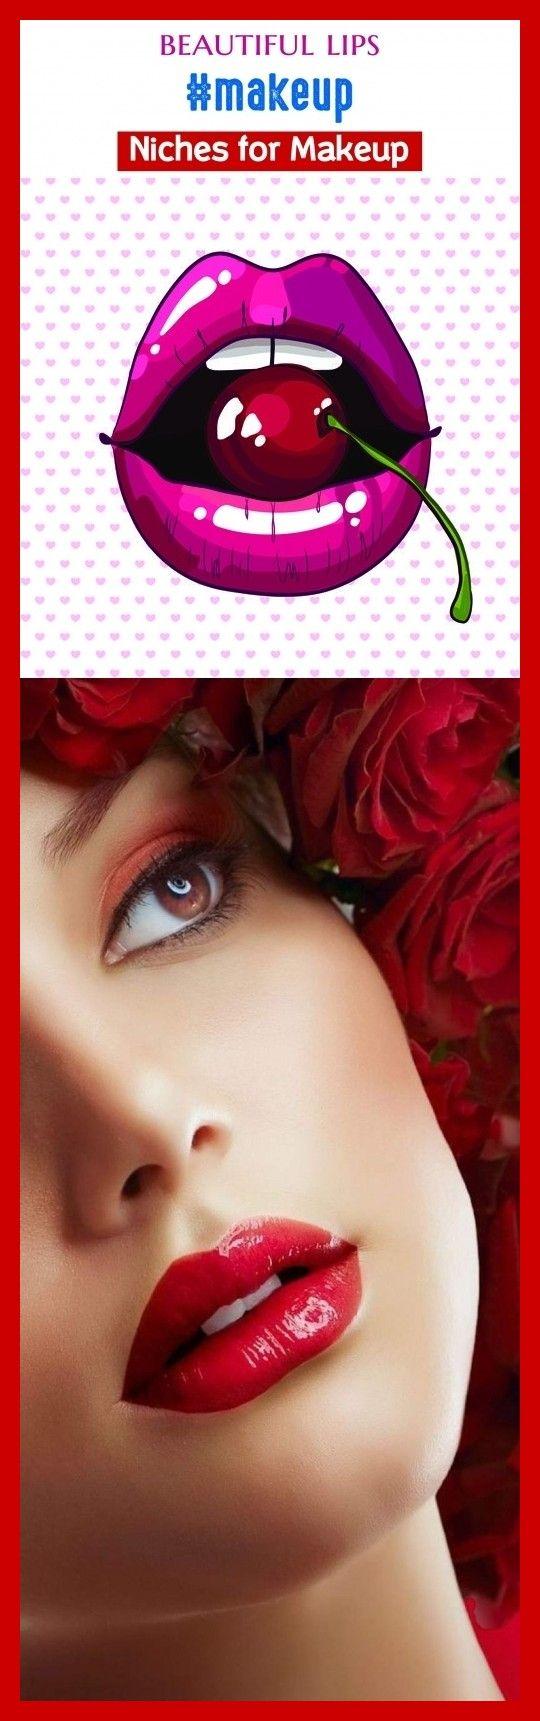 Beautiful lips makeup blog seo beauty. lips drawing